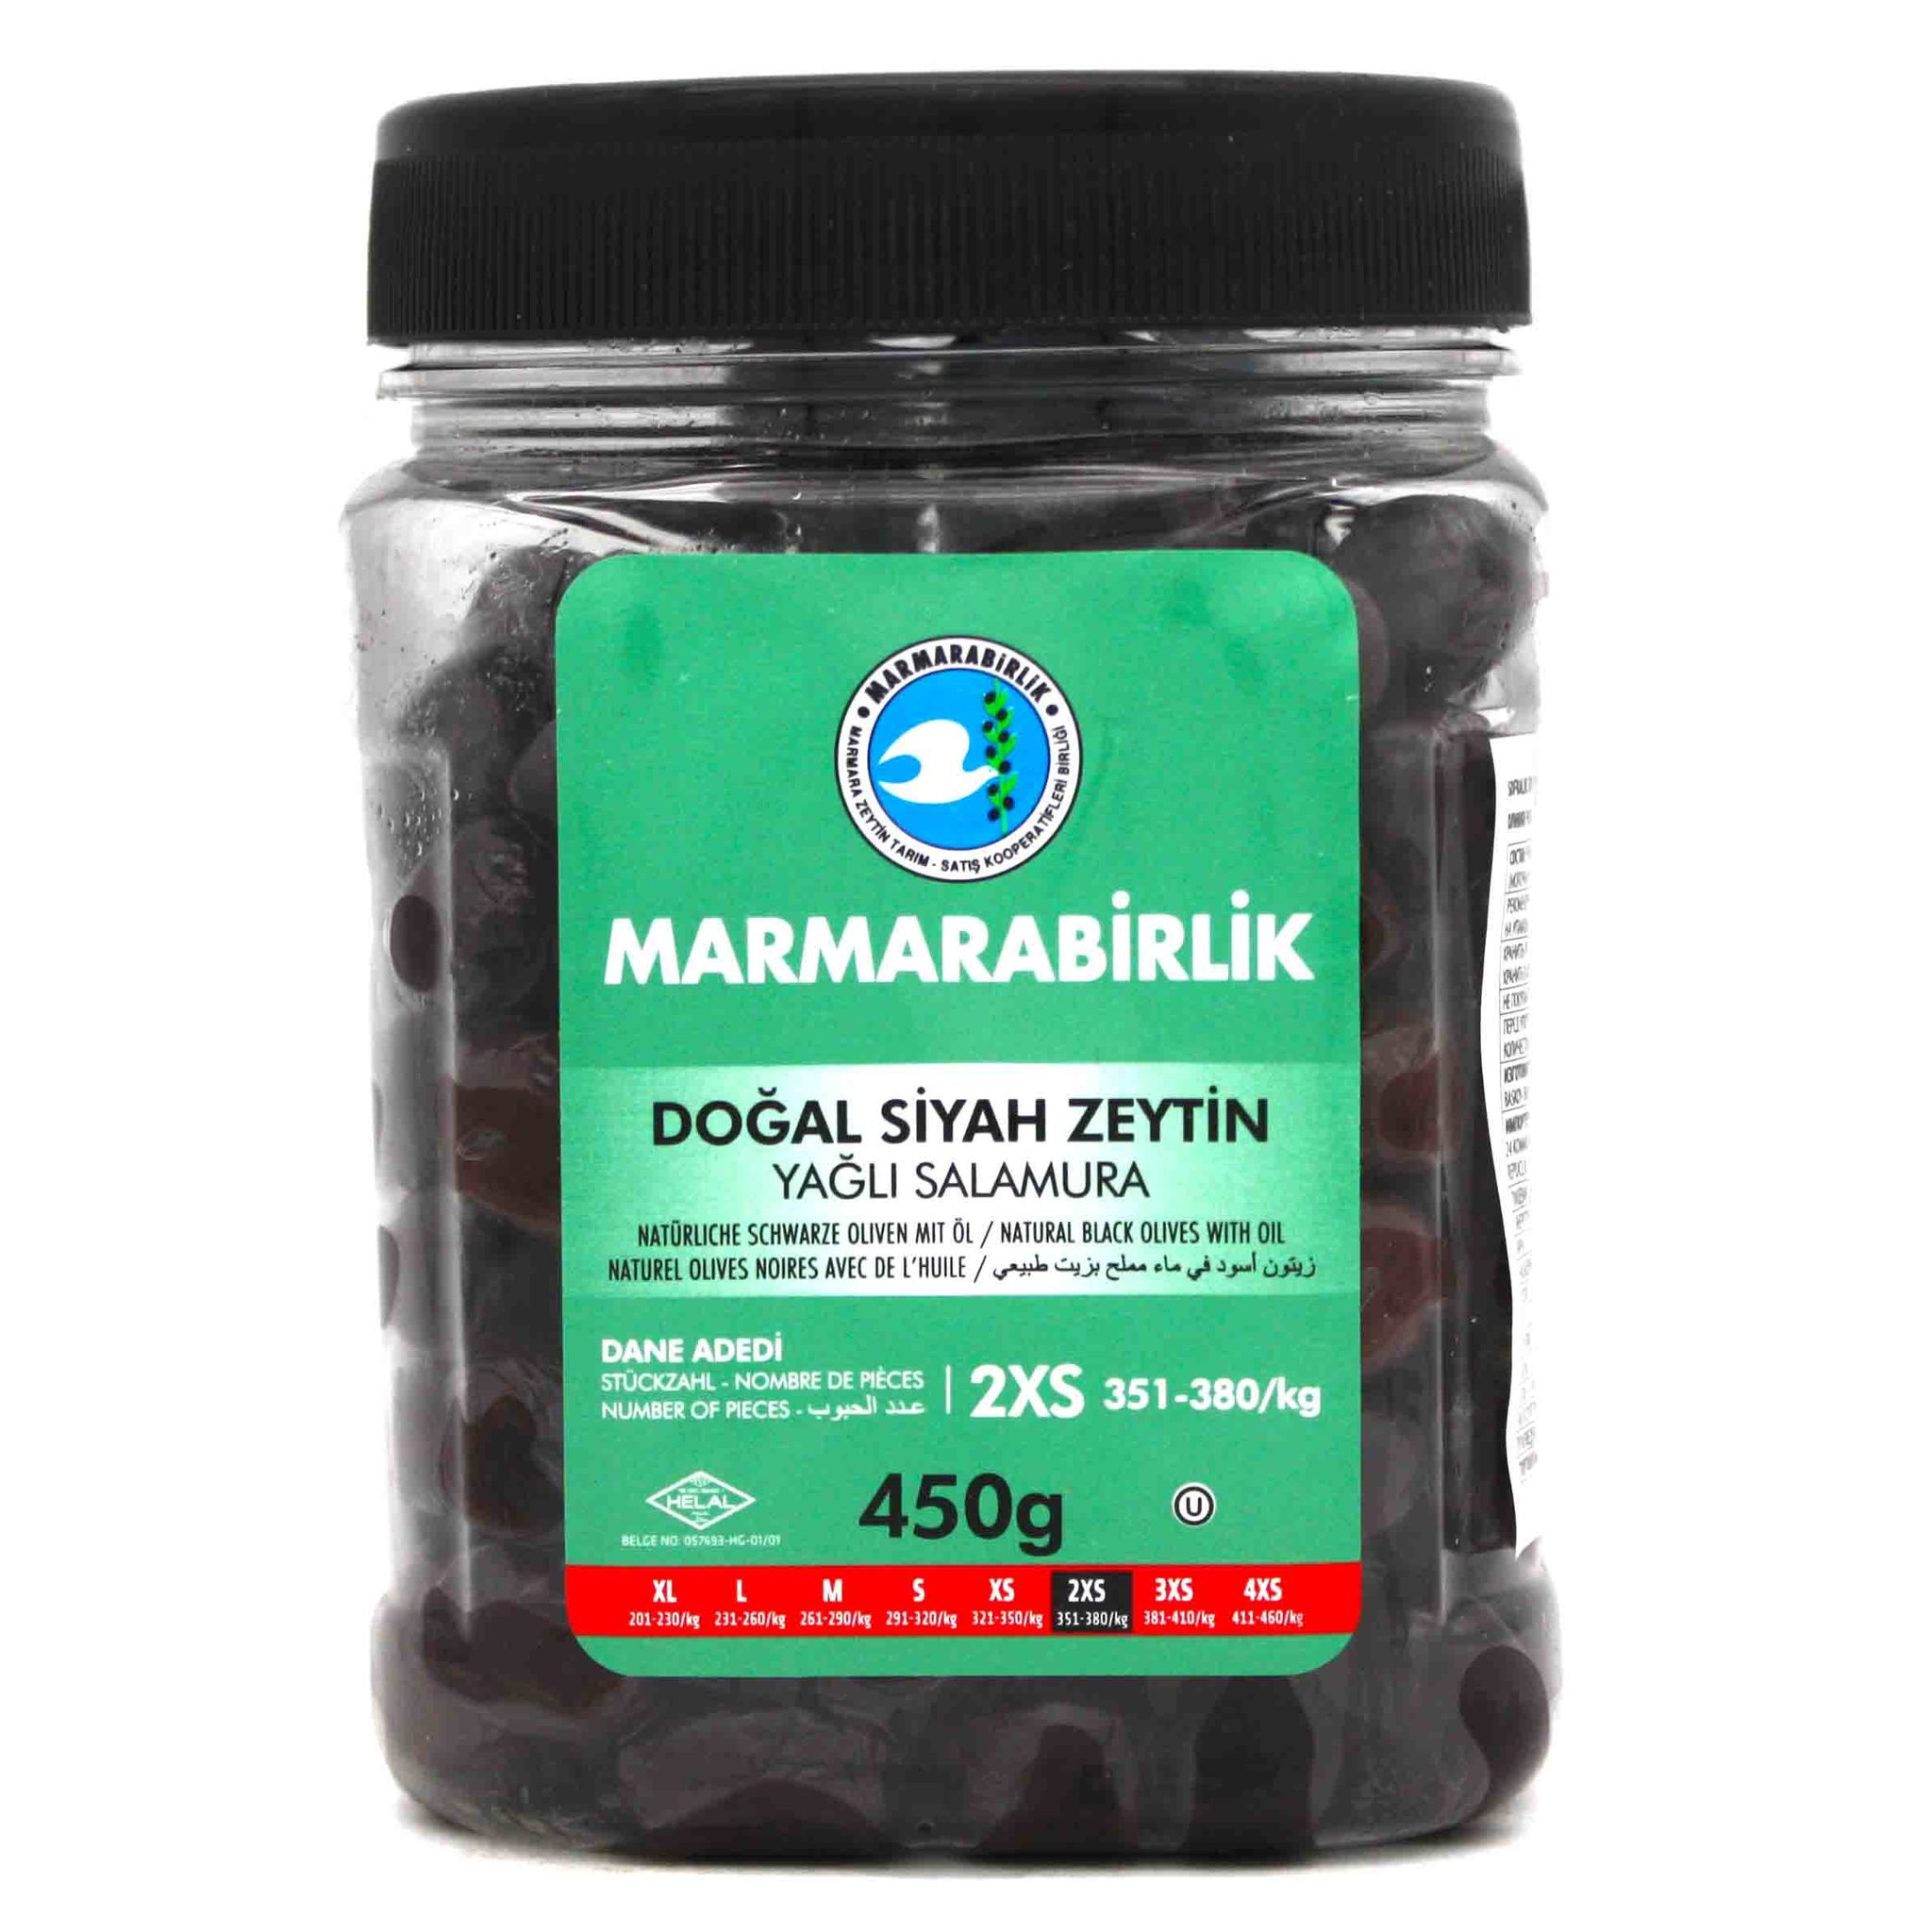 Marmarabirlik Маслины 2XS в масле, Marmarabirlik, 450 г import_files_6d_6d68b62d471a11eaa9c6484d7ecee297_04d6214b57cc11eaa9c7484d7ecee297.jpg